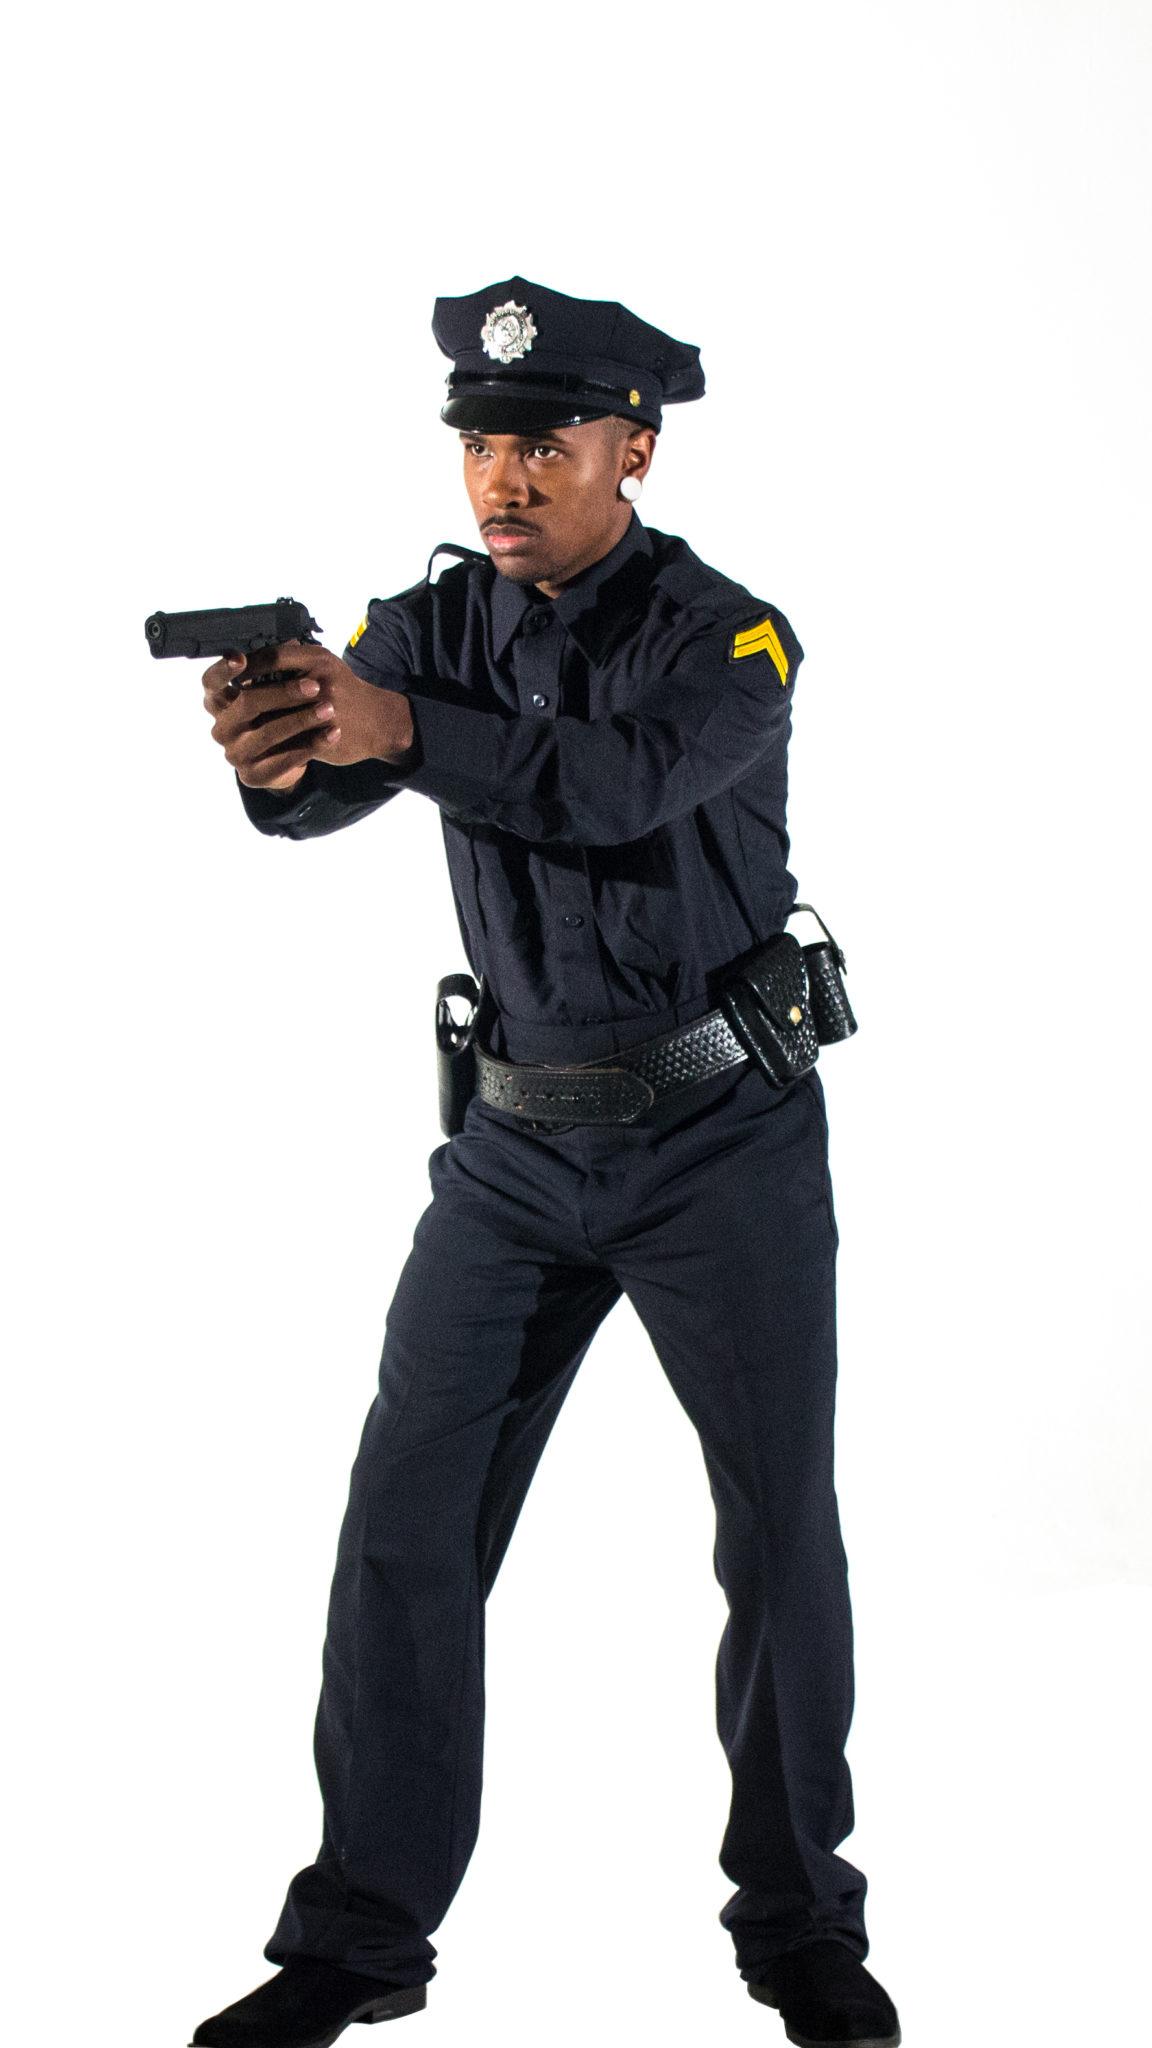 Police Uniform Costume Rentals In Los Angeles